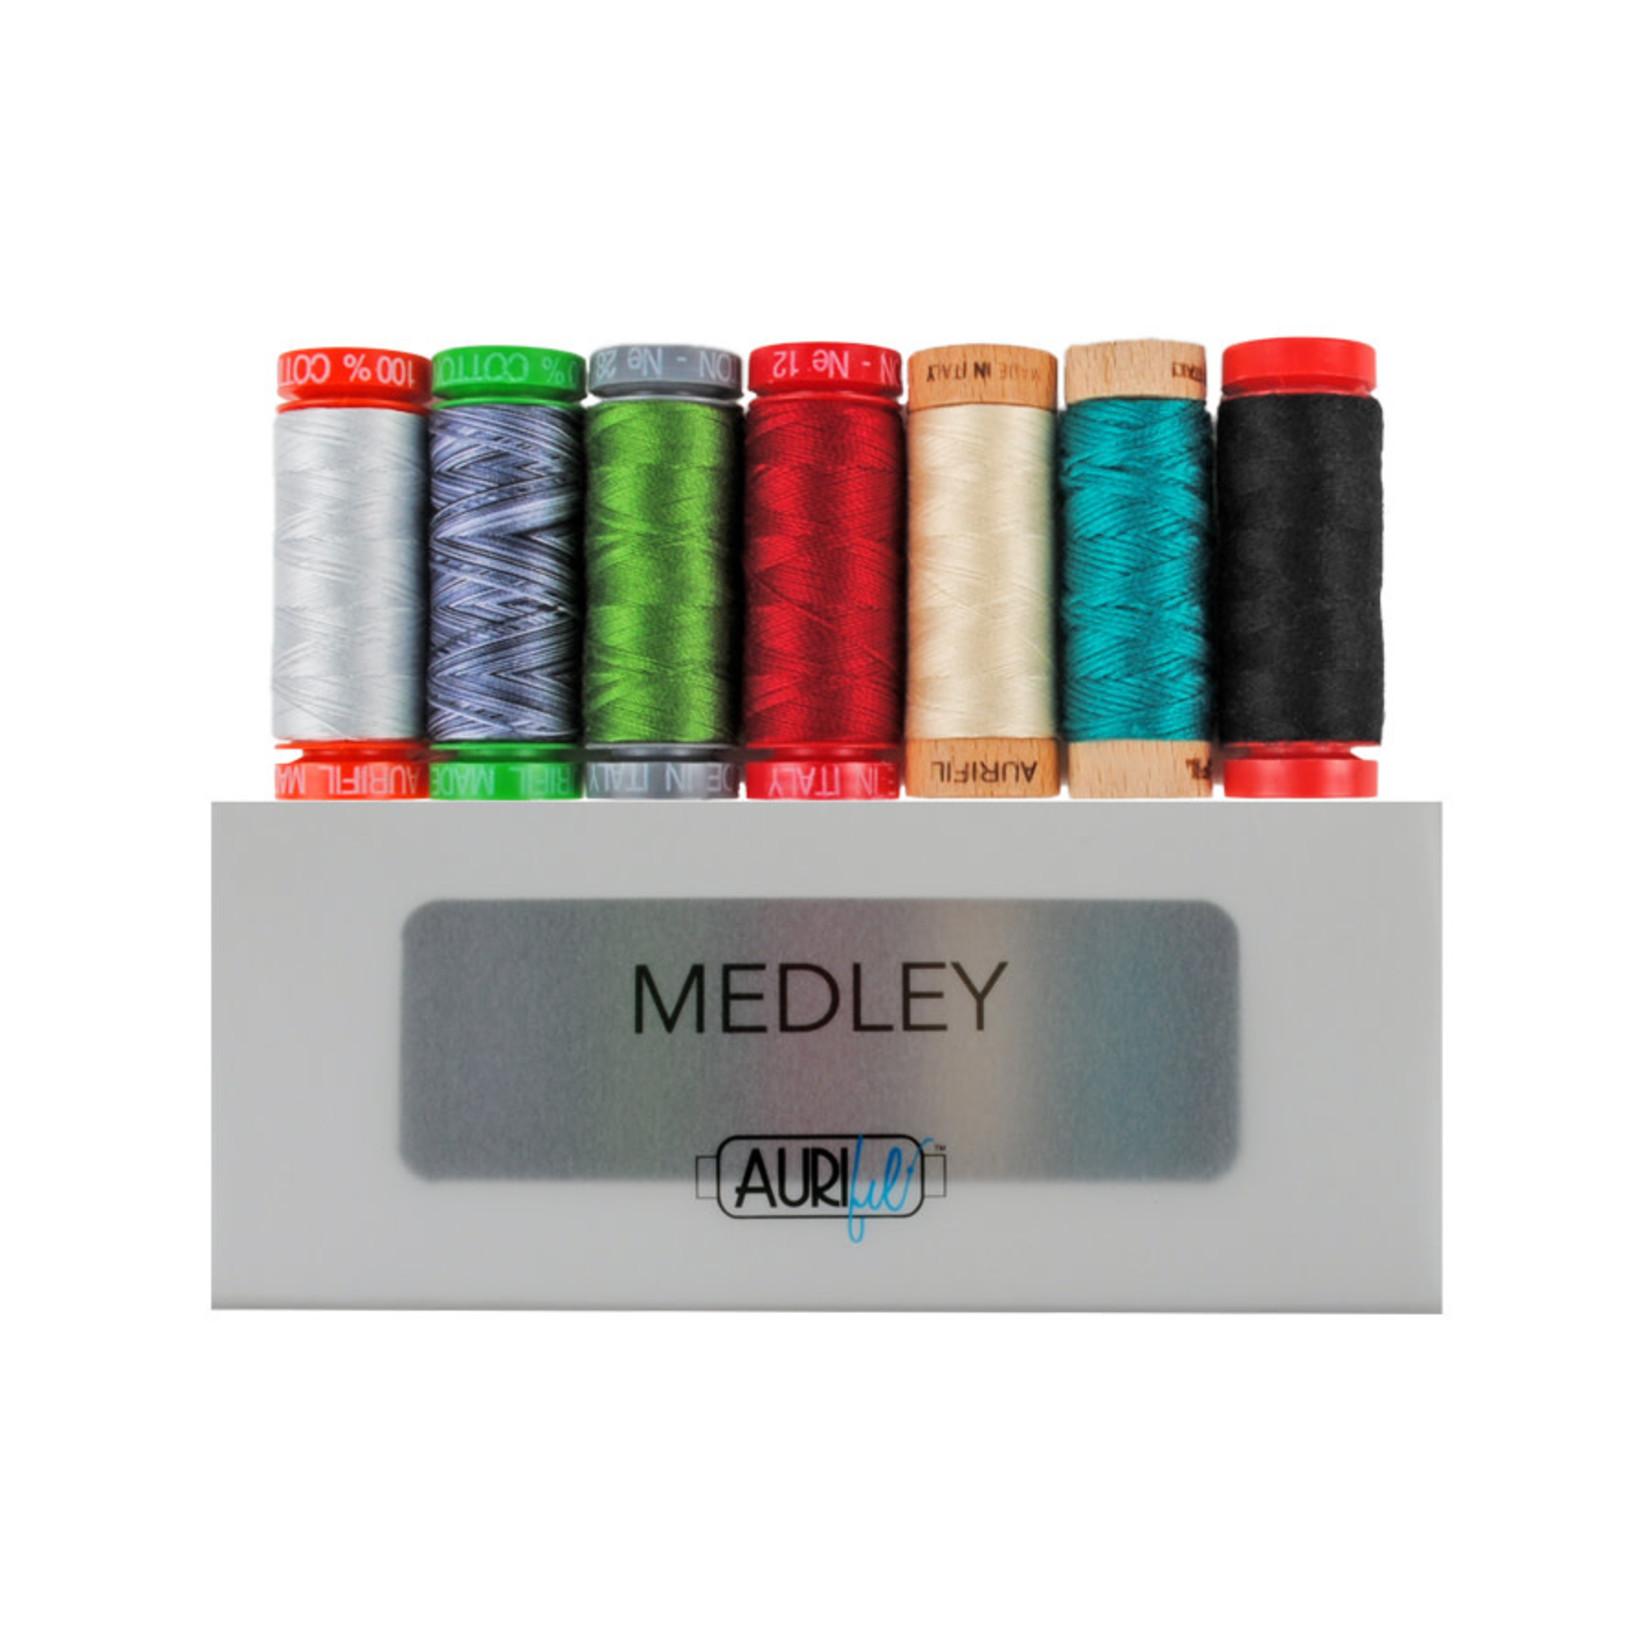 AURIFIL Medley Thread Collection - Aurifil